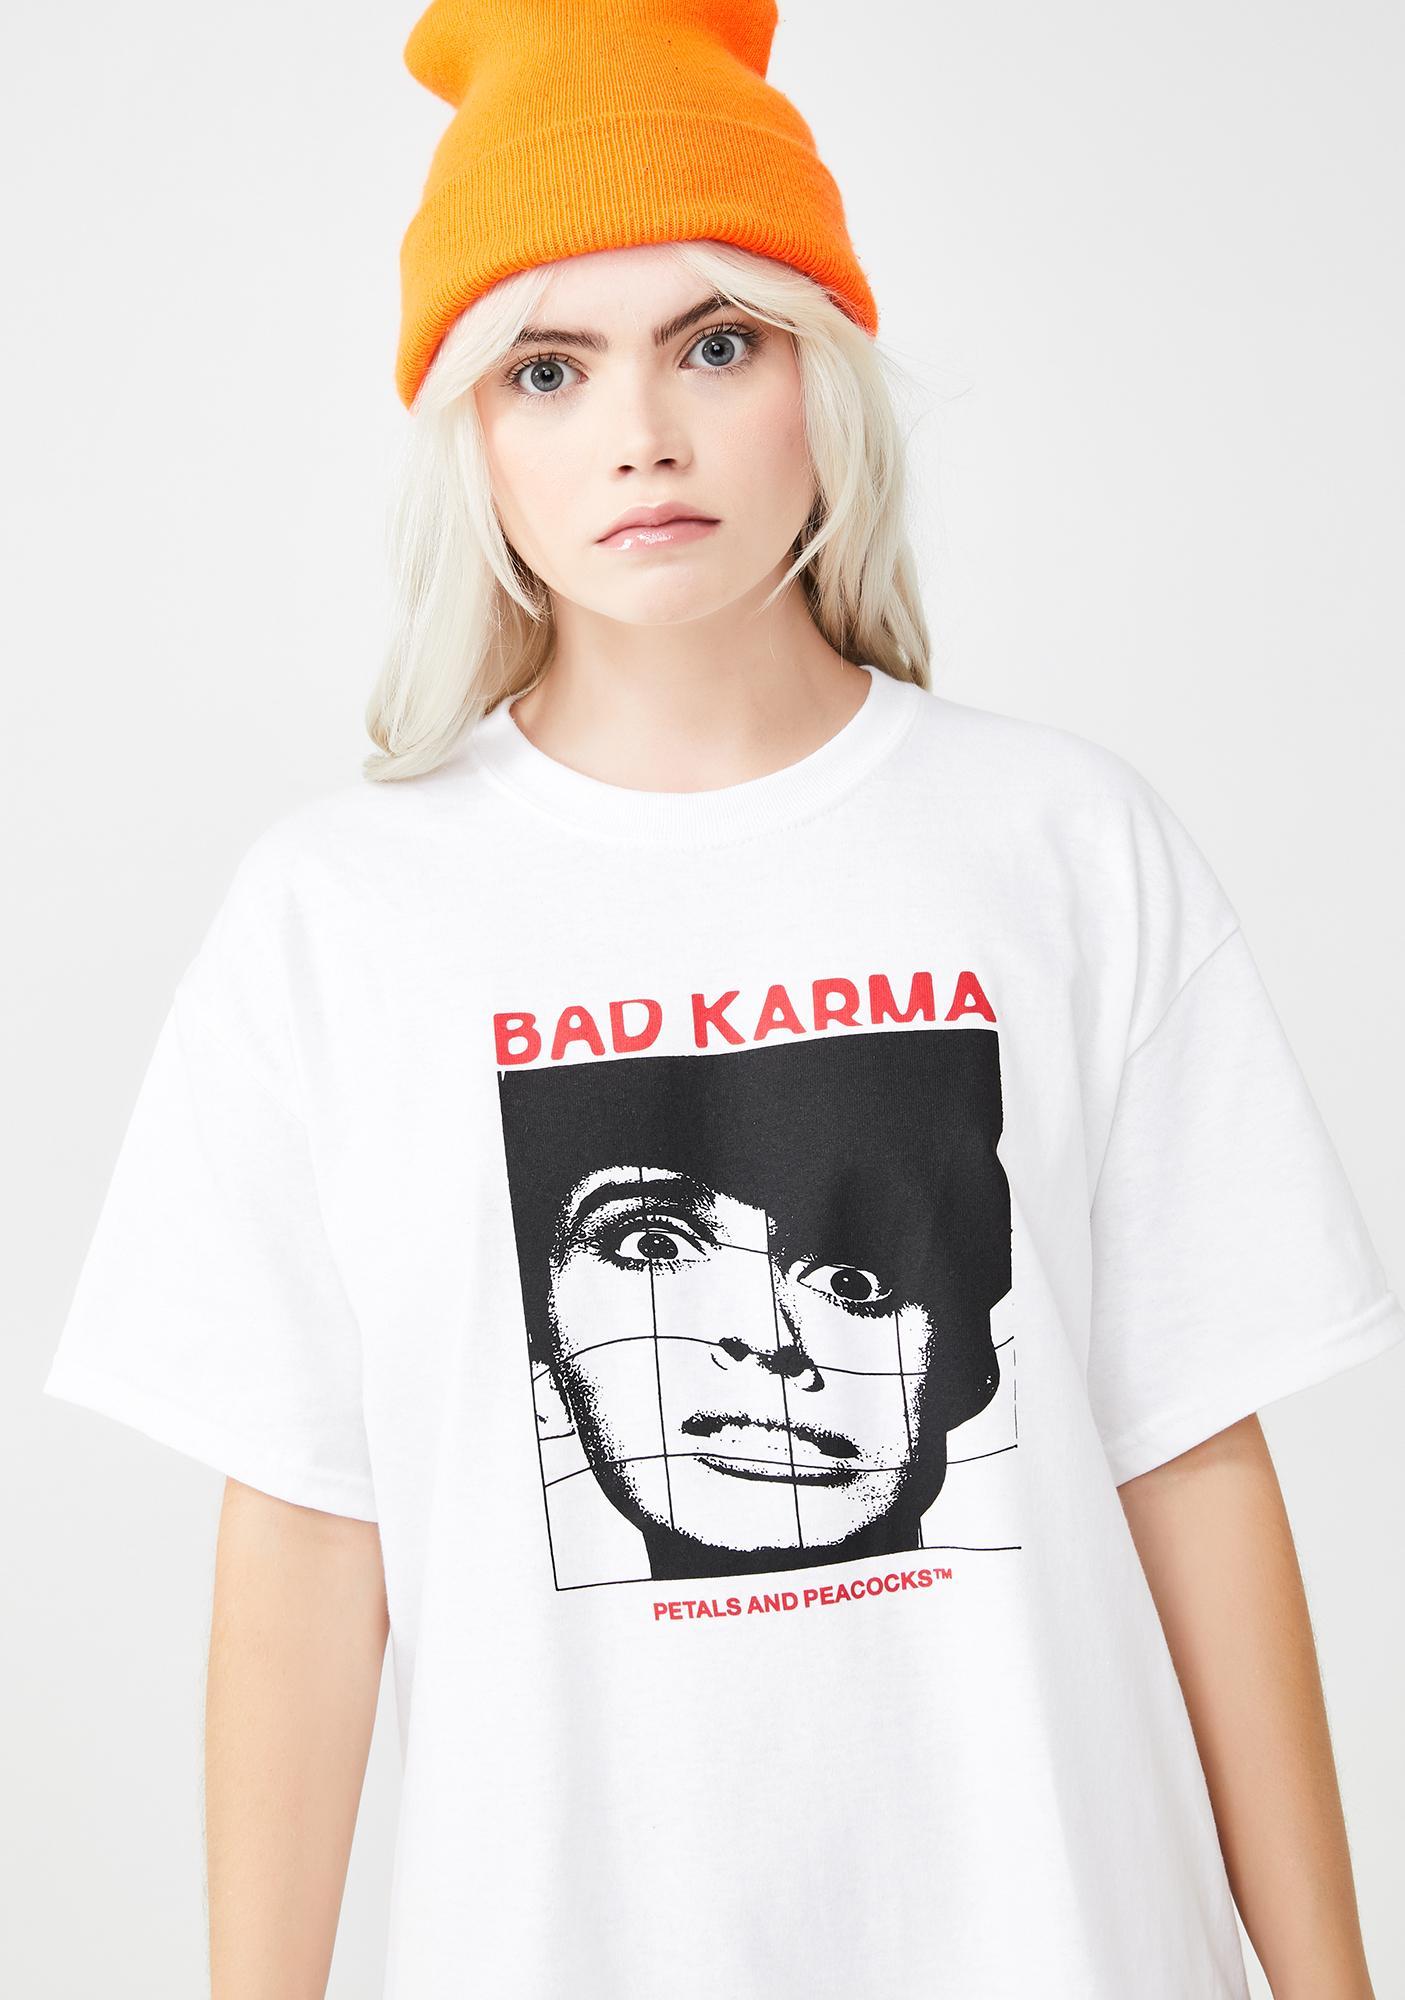 Petals and Peacocks Bad Karma Graphic Tee